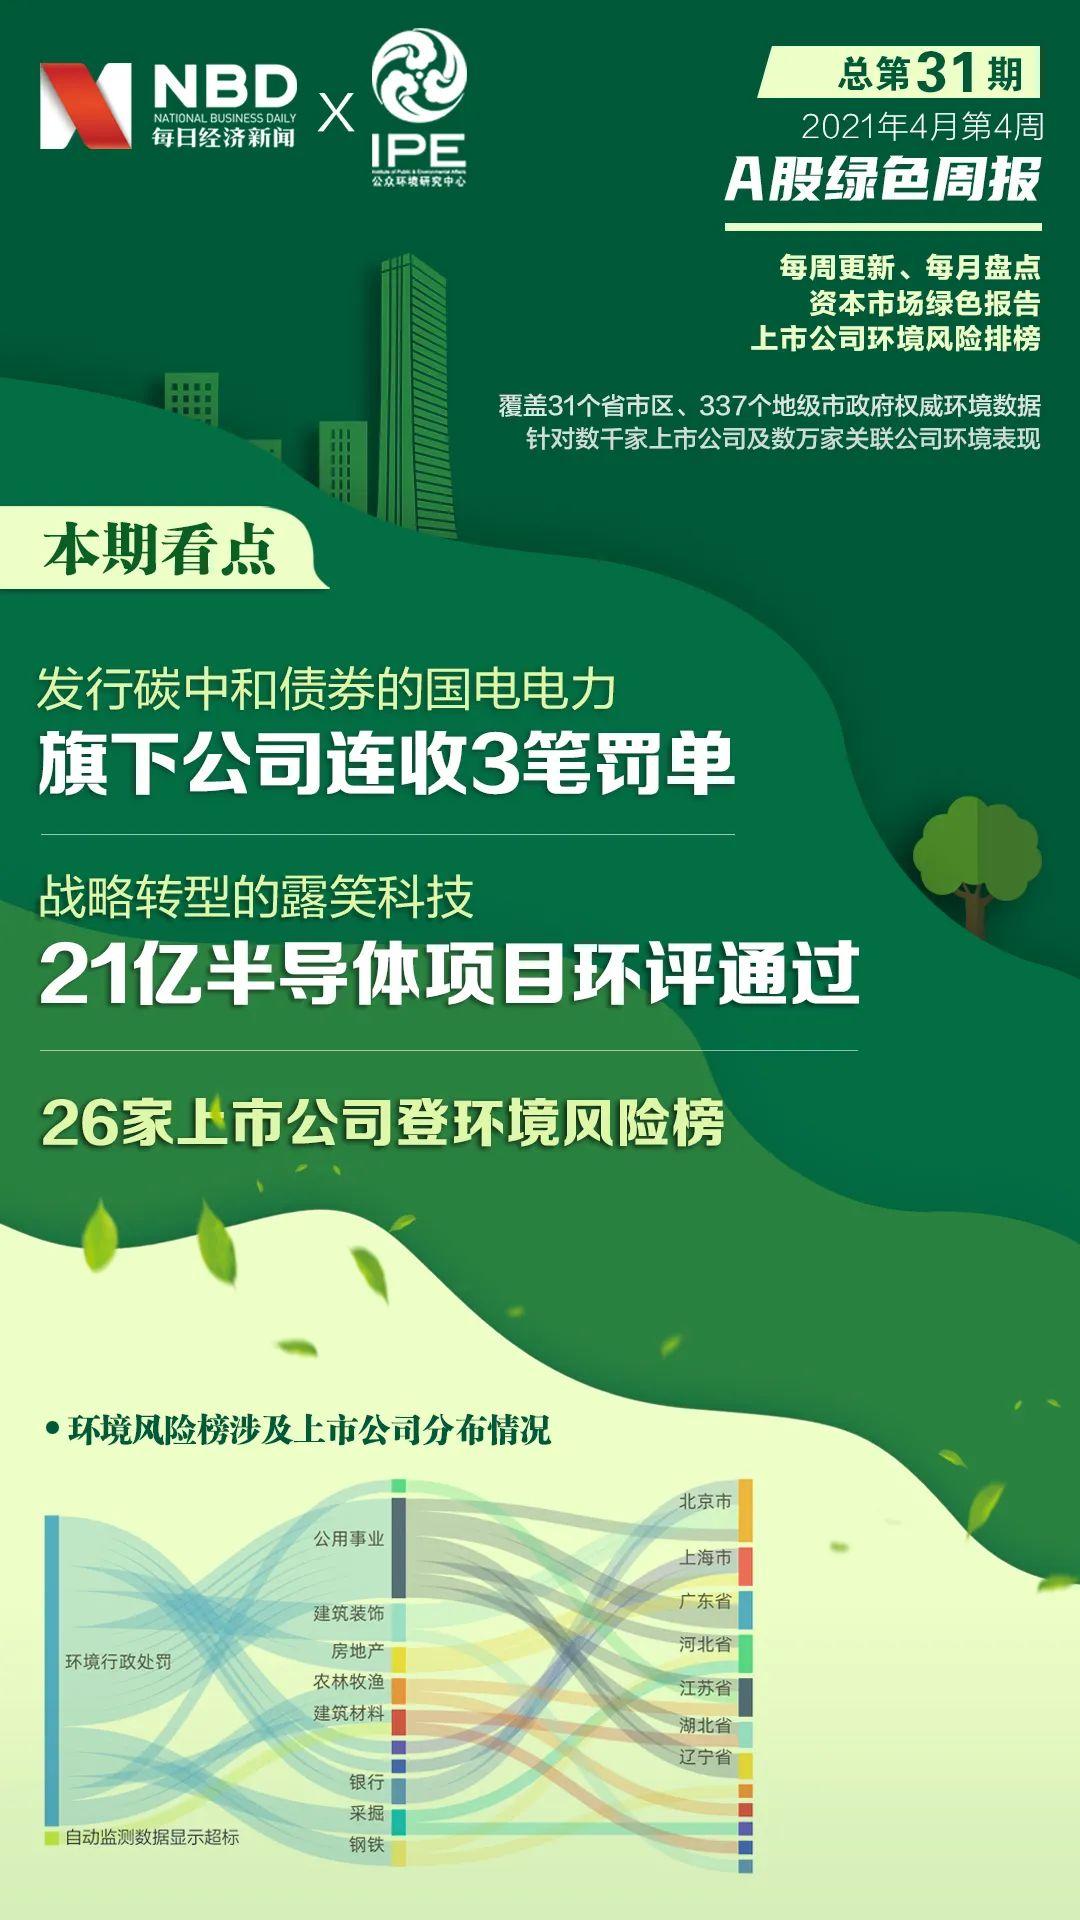 a股《绿色周刊》|卢晓科技的21亿半导体项目通过了环评,国电电力公司收到三张罚单